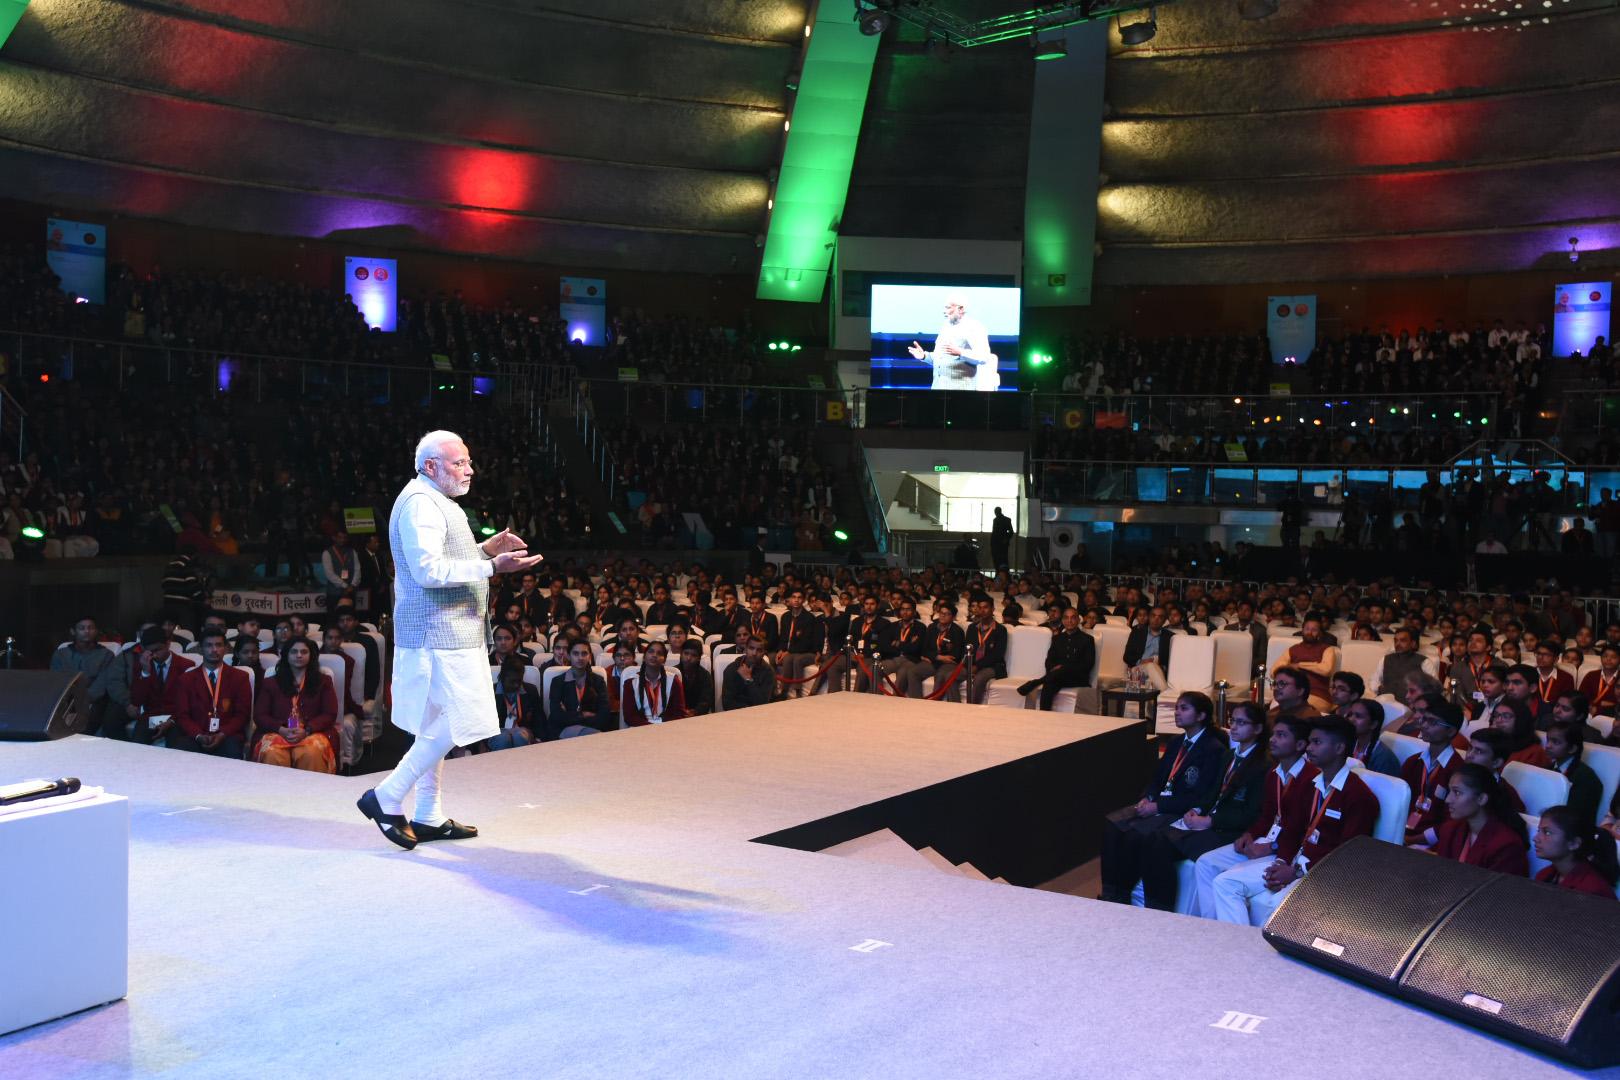 PM Modi visits Arunachal Pradesh, inaugurates Convention Centre in Itanagar